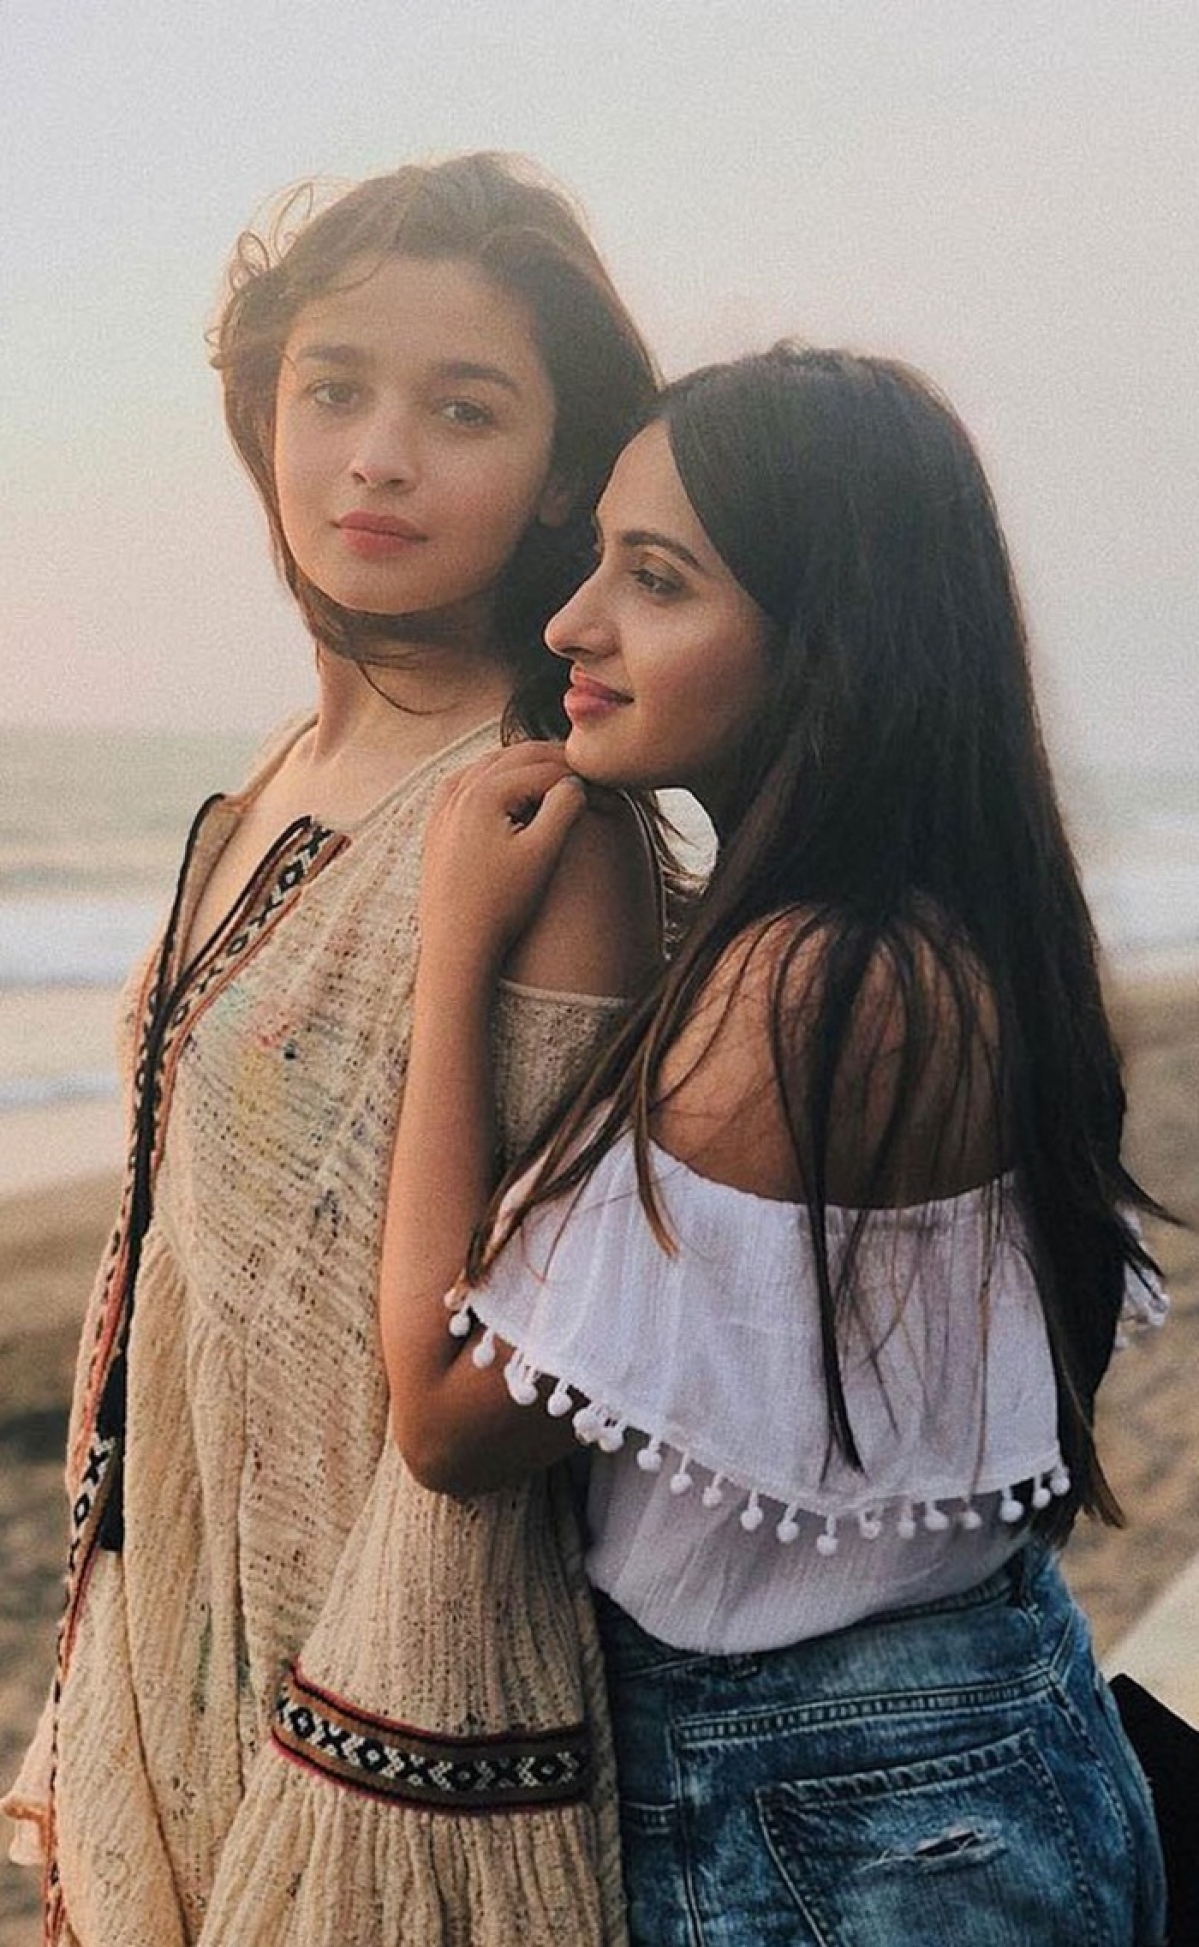 Check out: Alia Bhatt and BFF Akansha Ranjan Kapoor parties with her girl gang